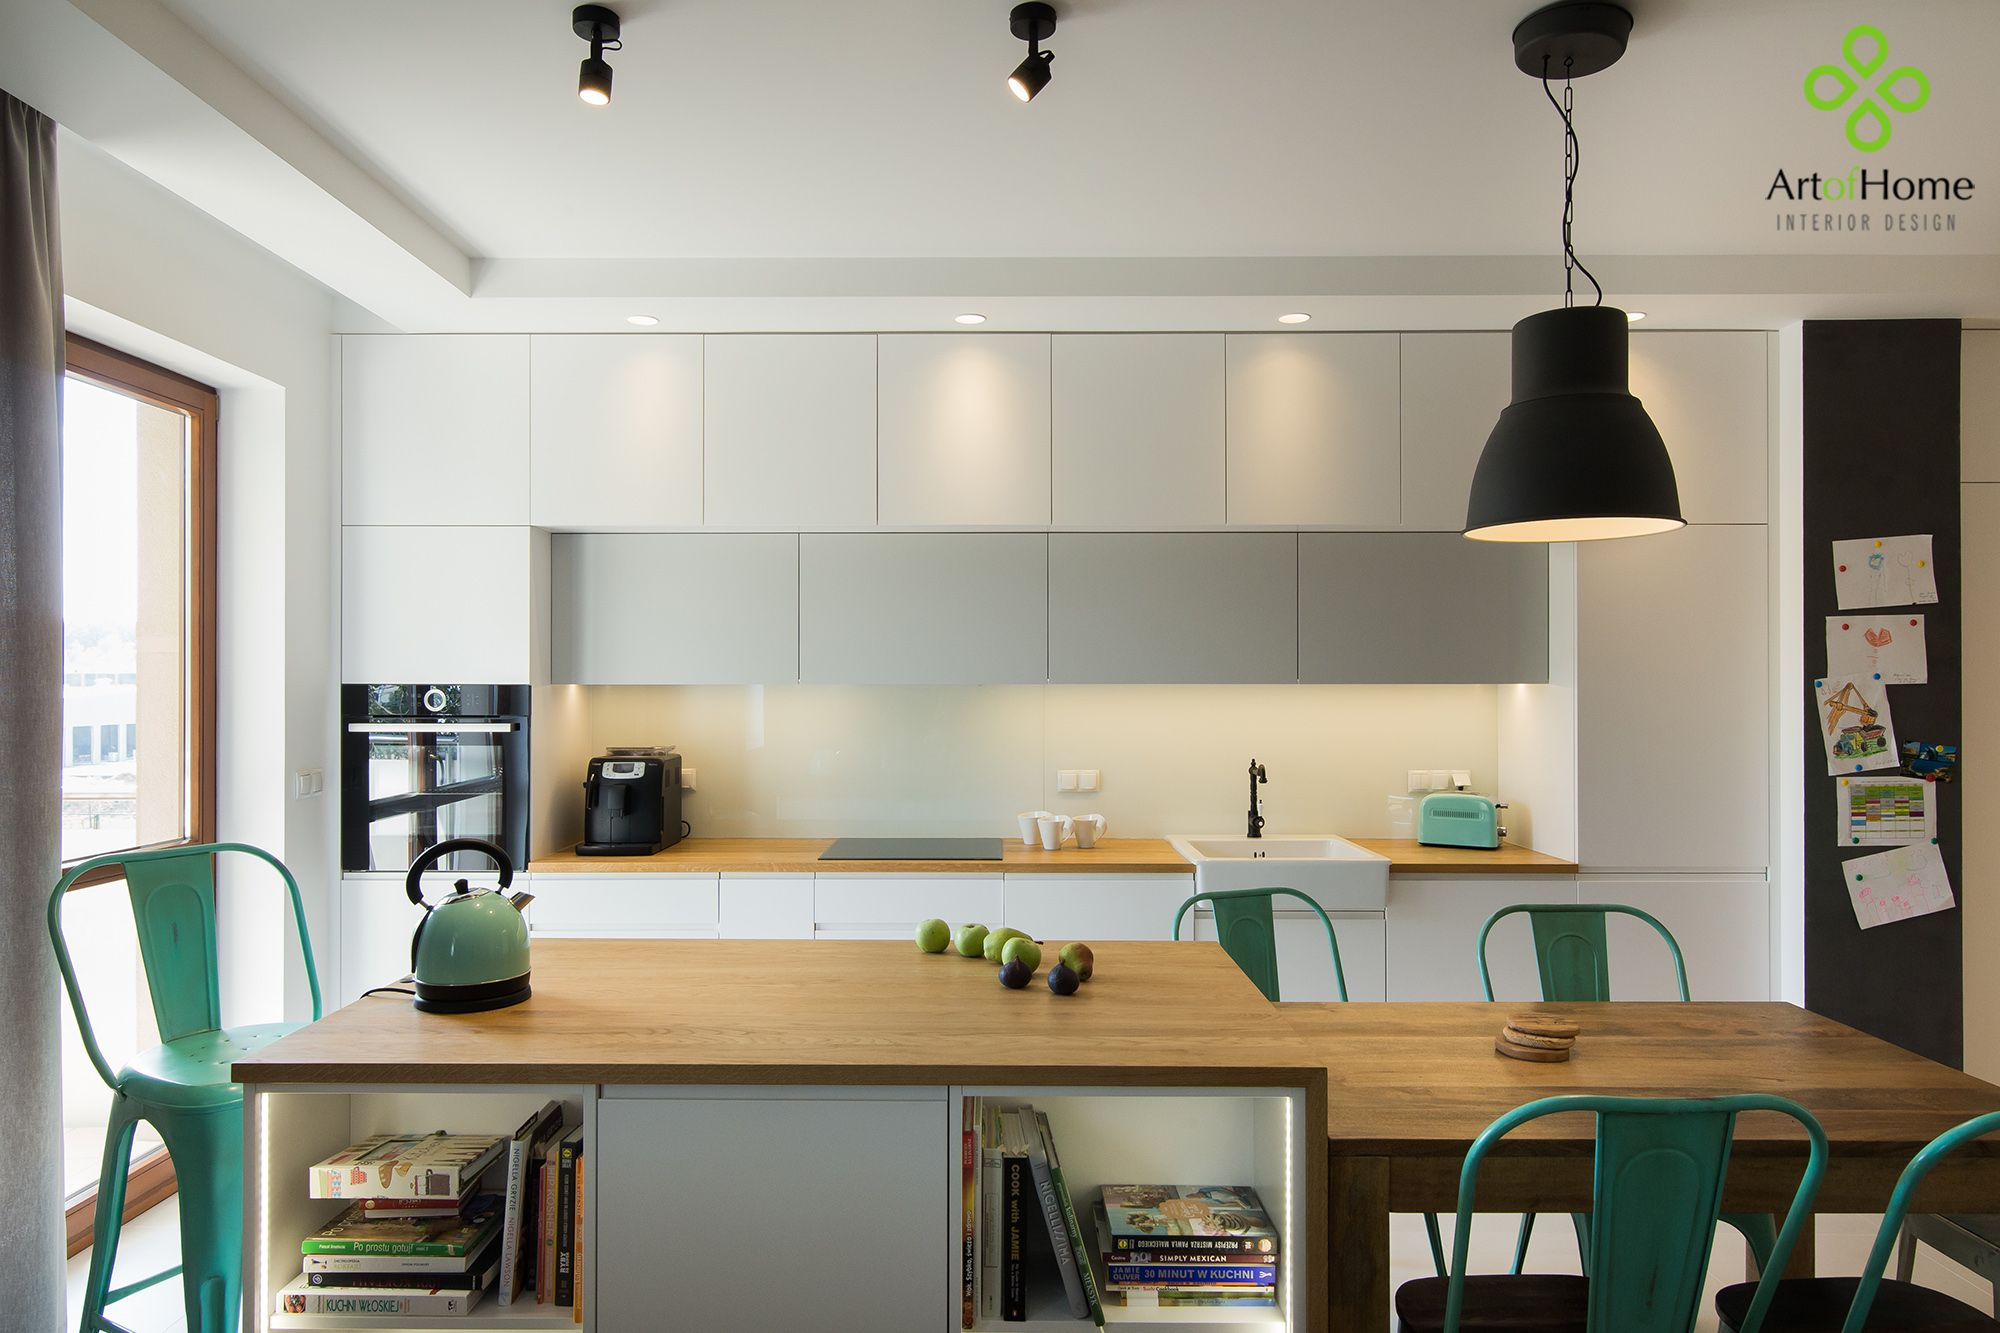 Foorni Pl Projekt Artofhome Minimal Realisation White Matte Fronts Kitchen Glass On Wall Kitchenisland Blackboard Wall White Kitchen Home Decor